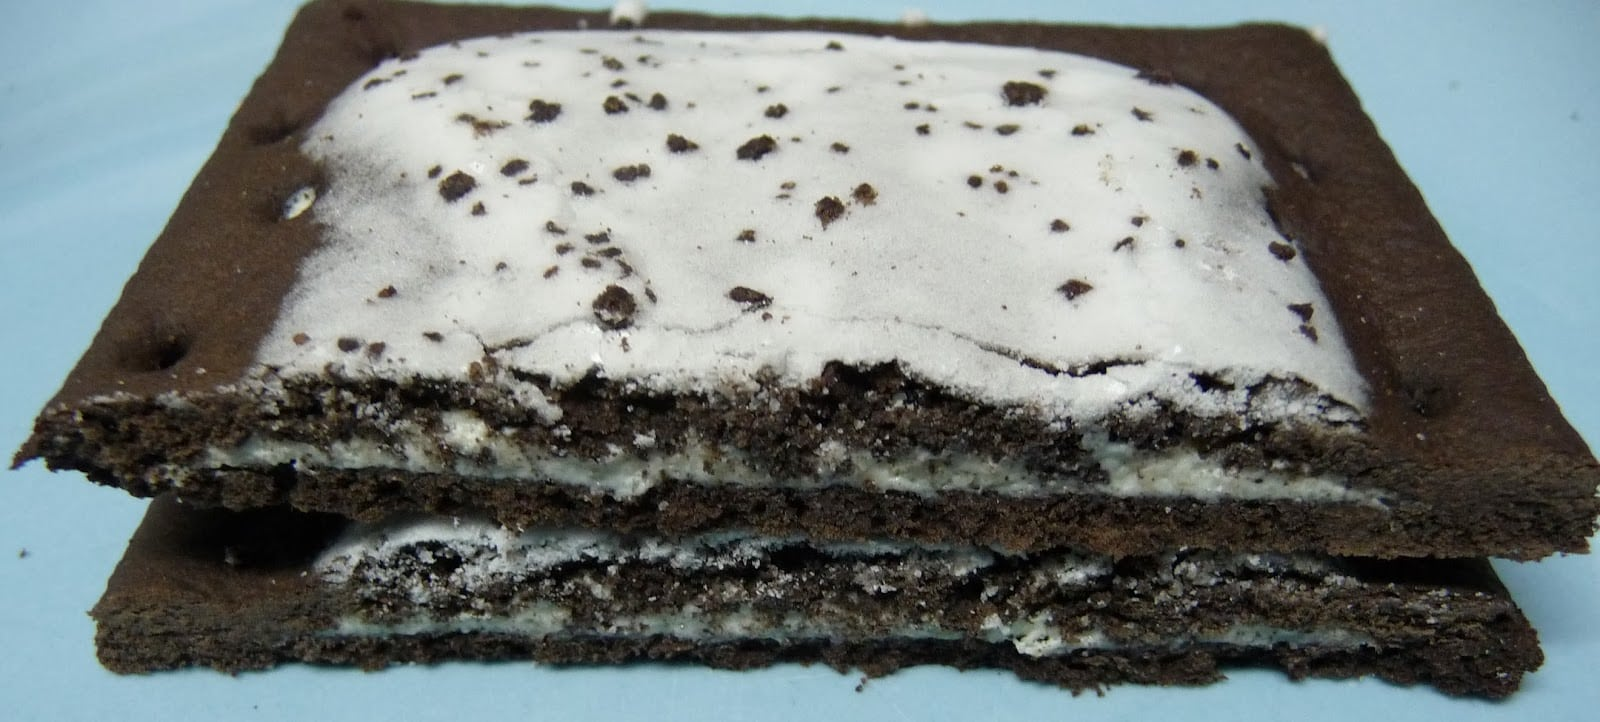 Cookies And Cream Pop Tarts